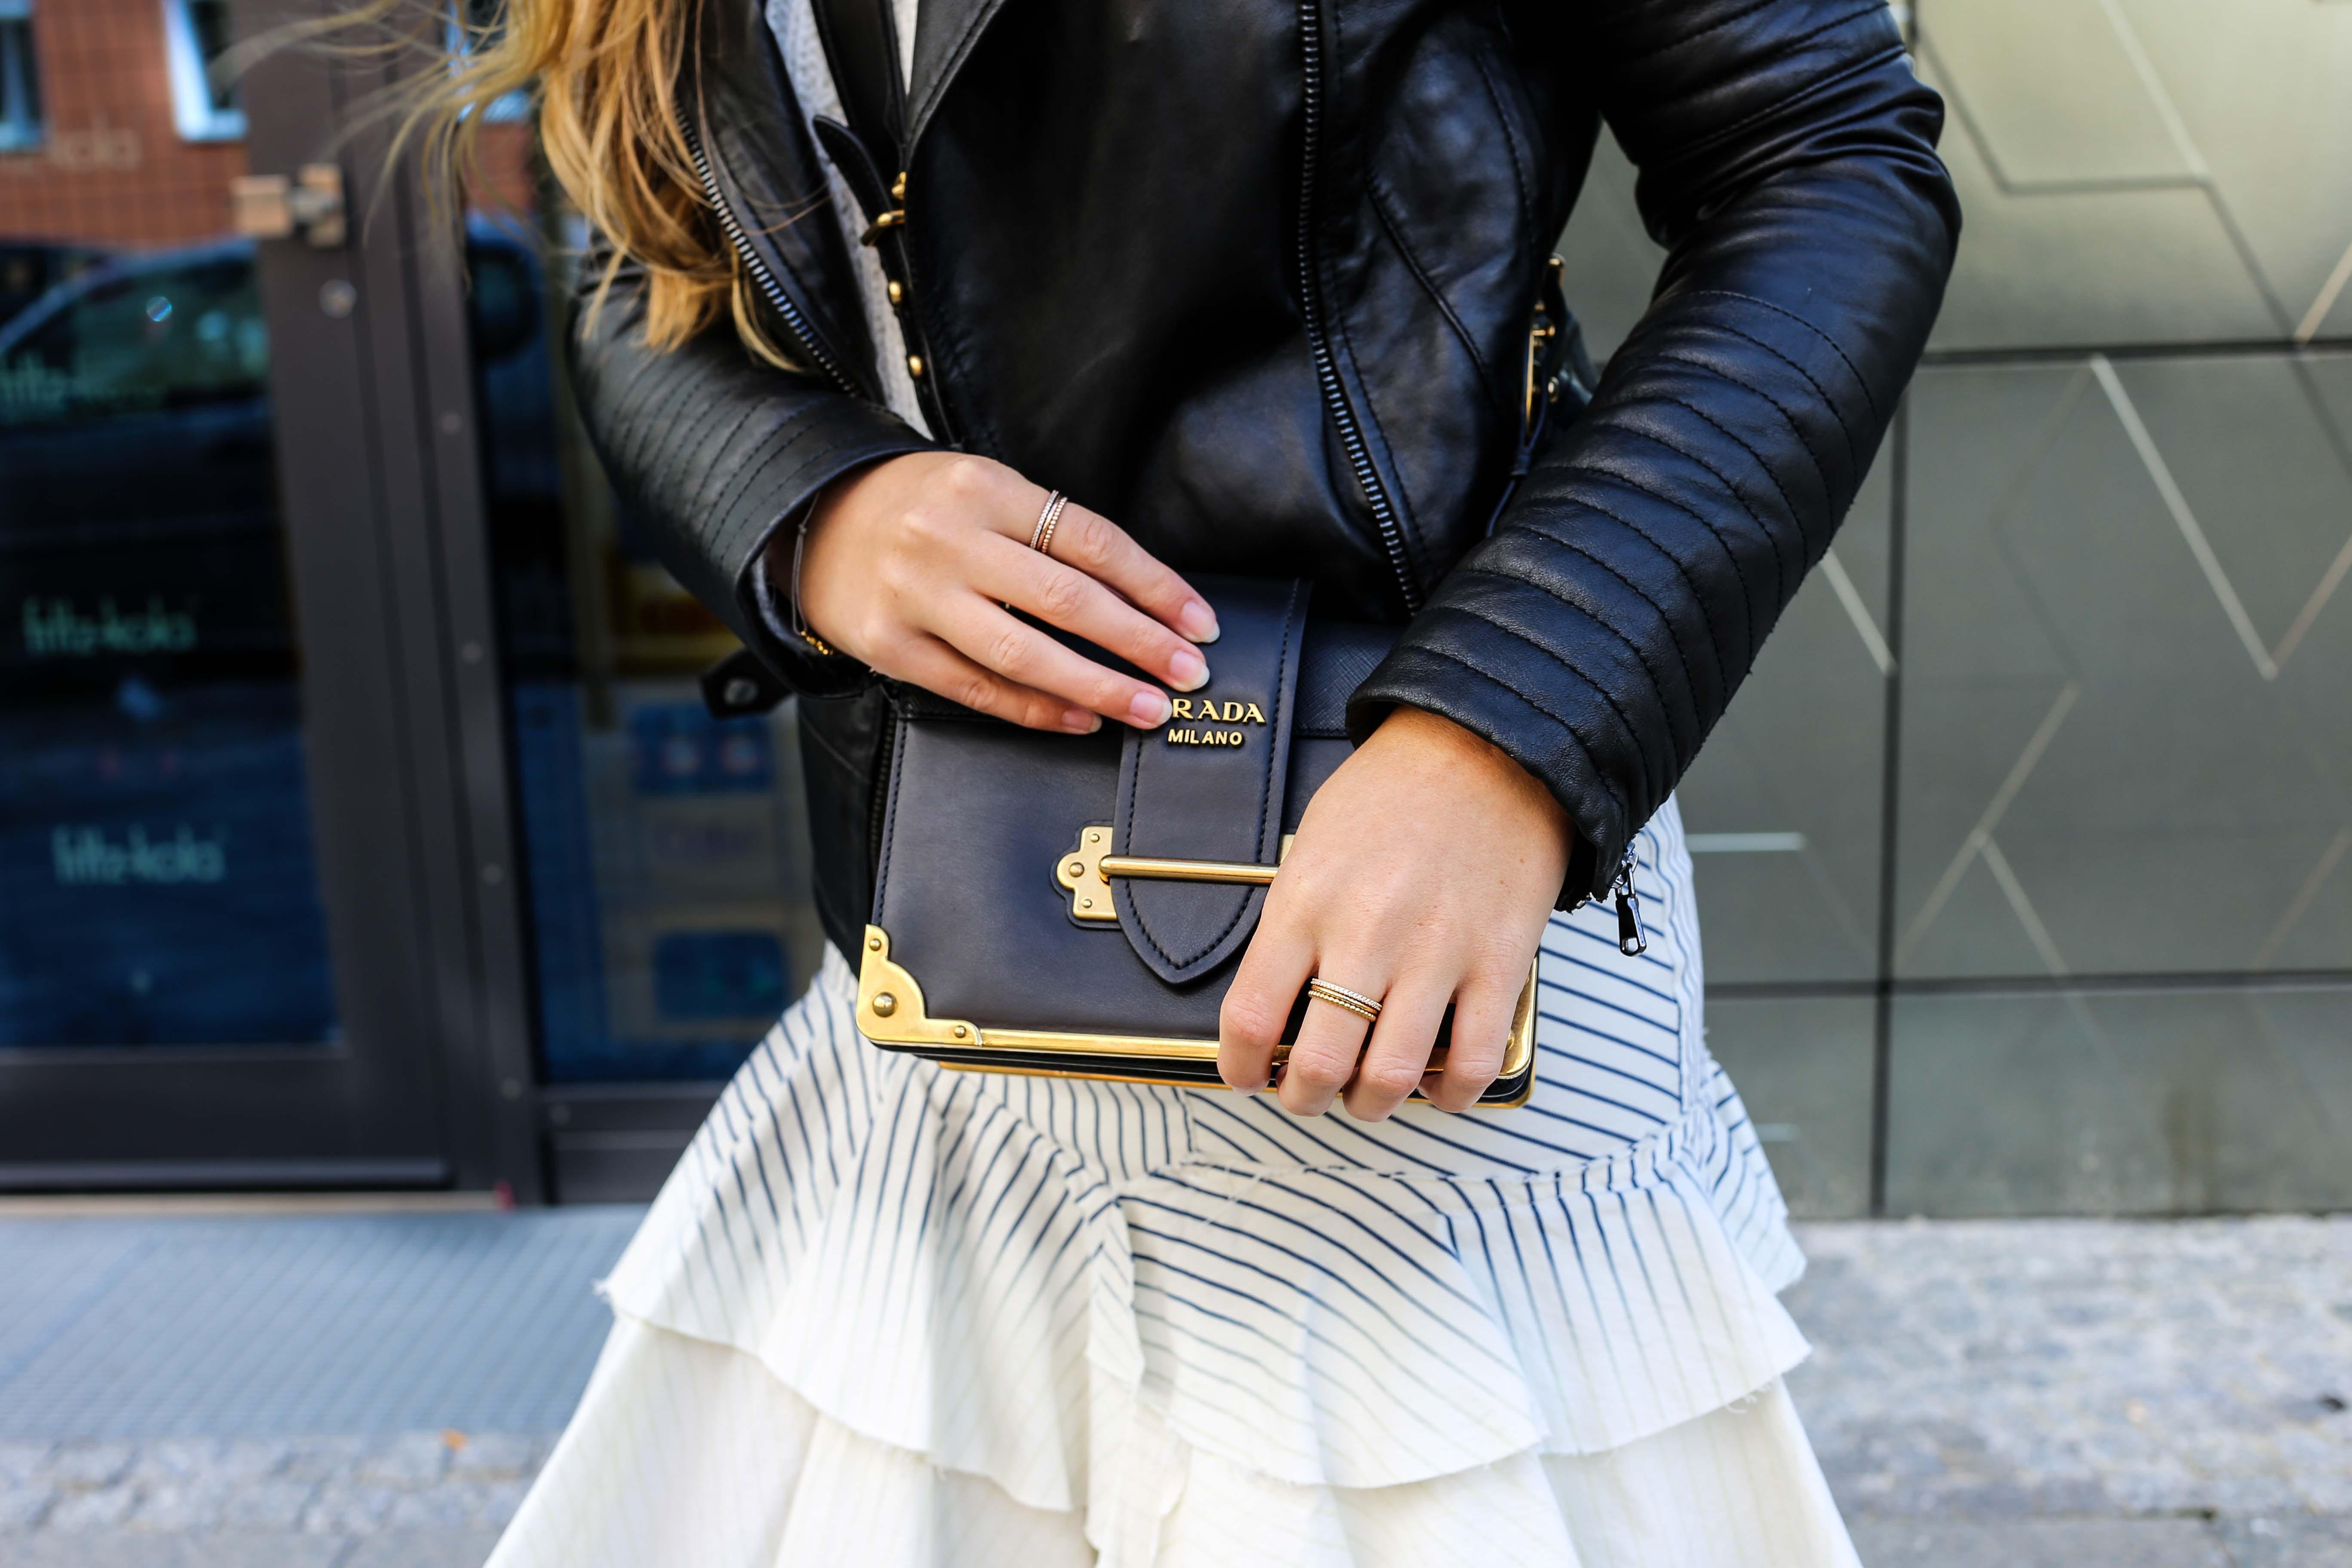 Fashion Week Outfit Berlin Prada Cahier Bag schwarz Thomas Sabo ringe gold Lederjacke Streetstyle Modeblog 7